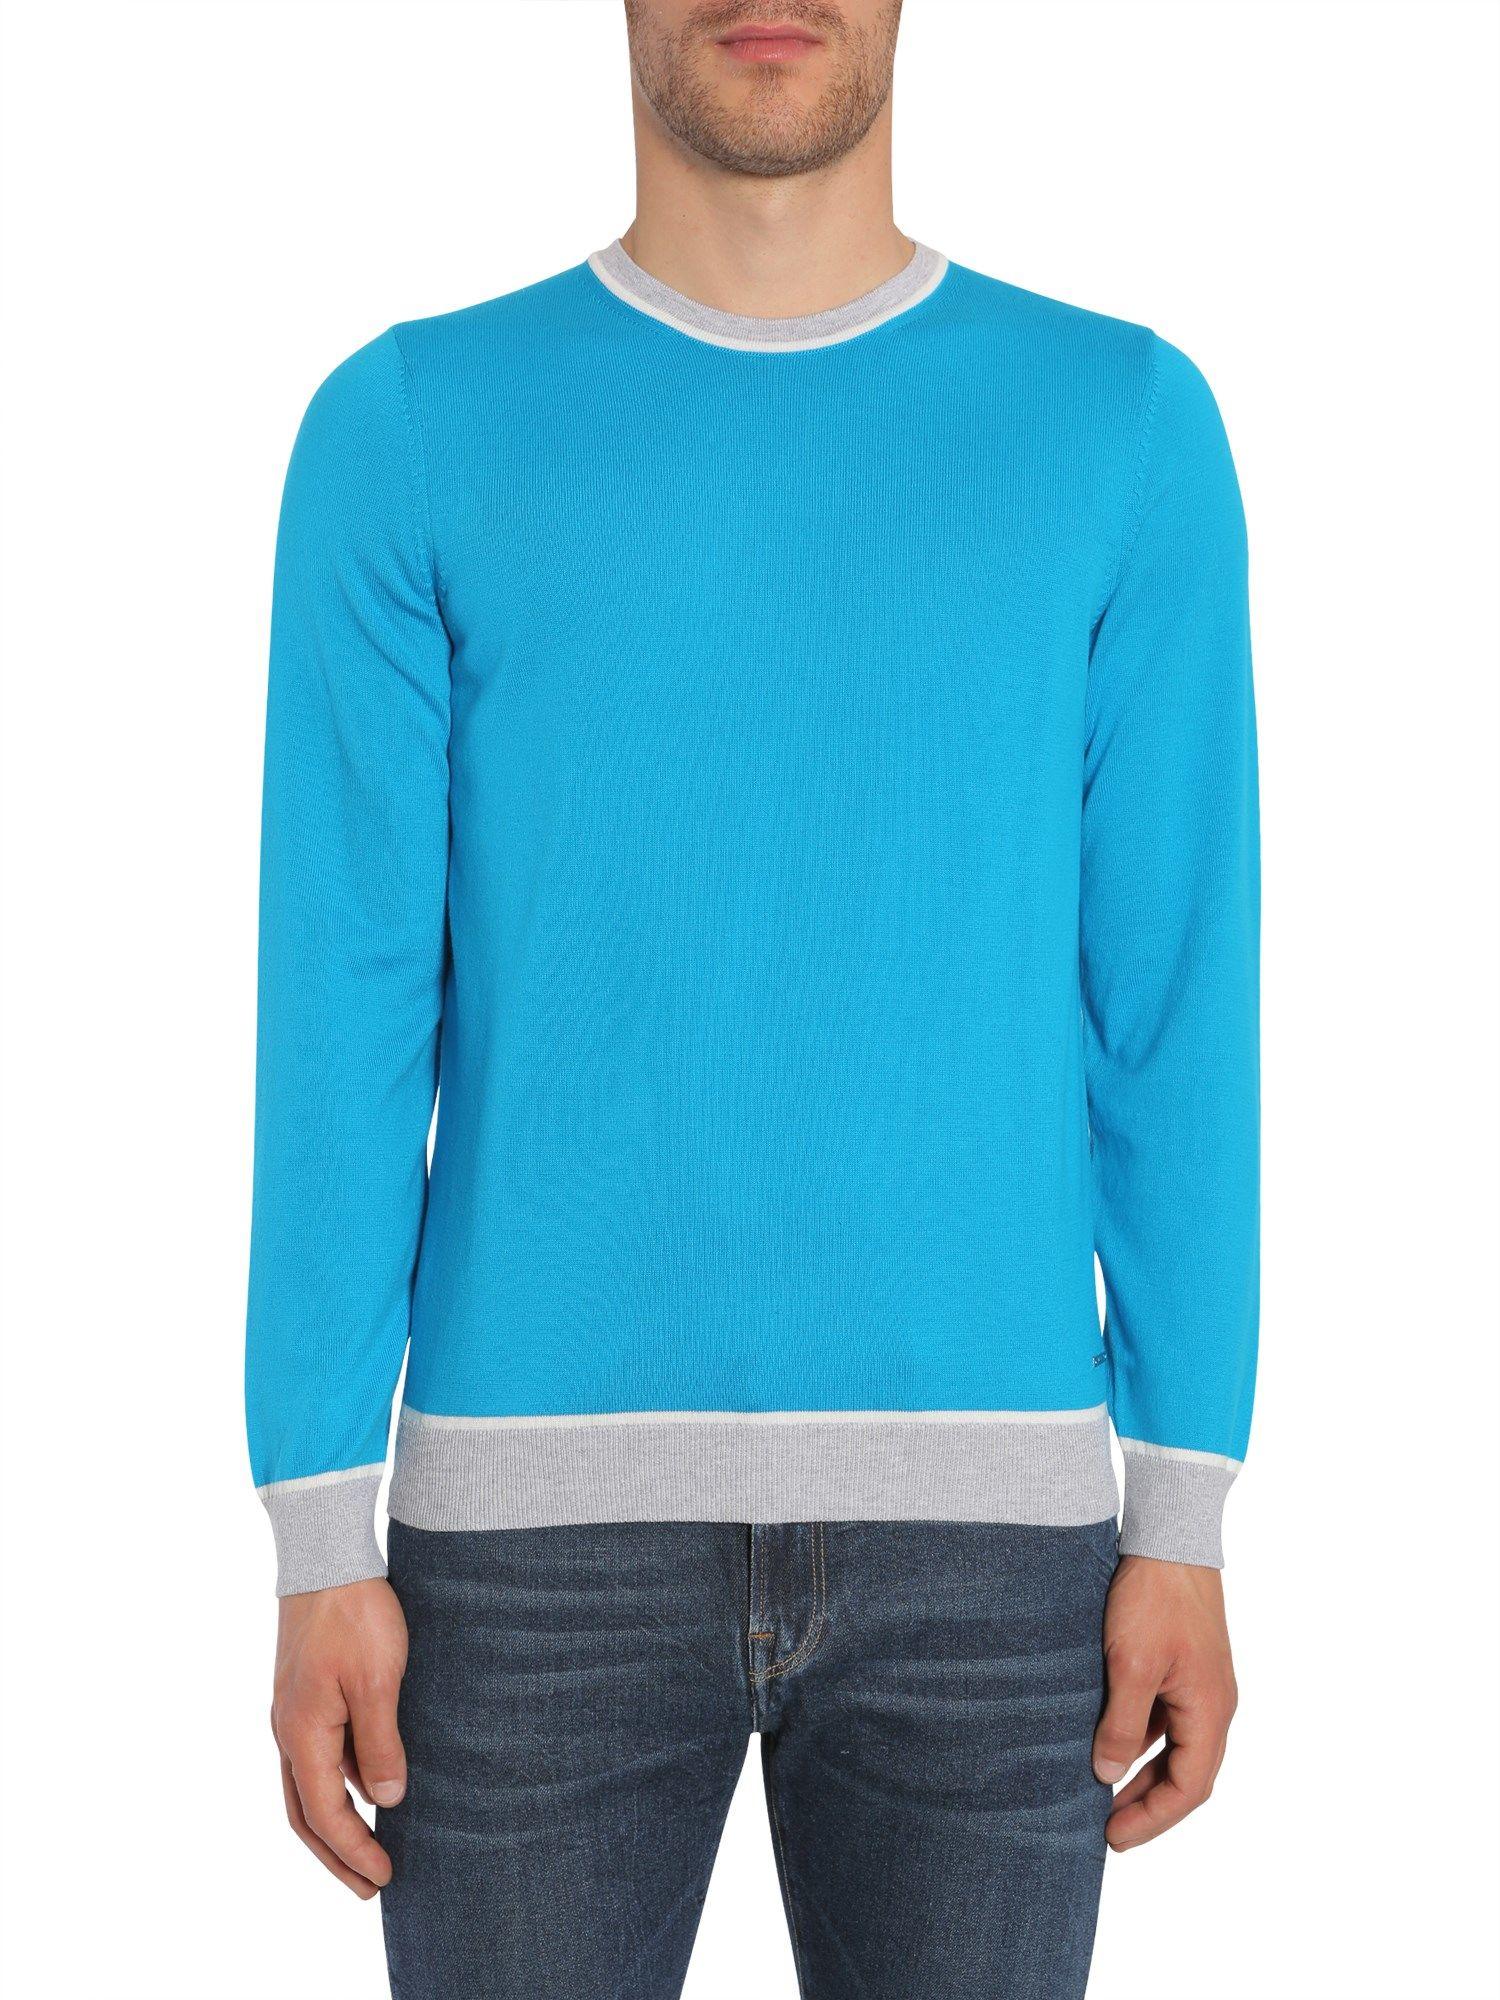 Marcelli Sweater